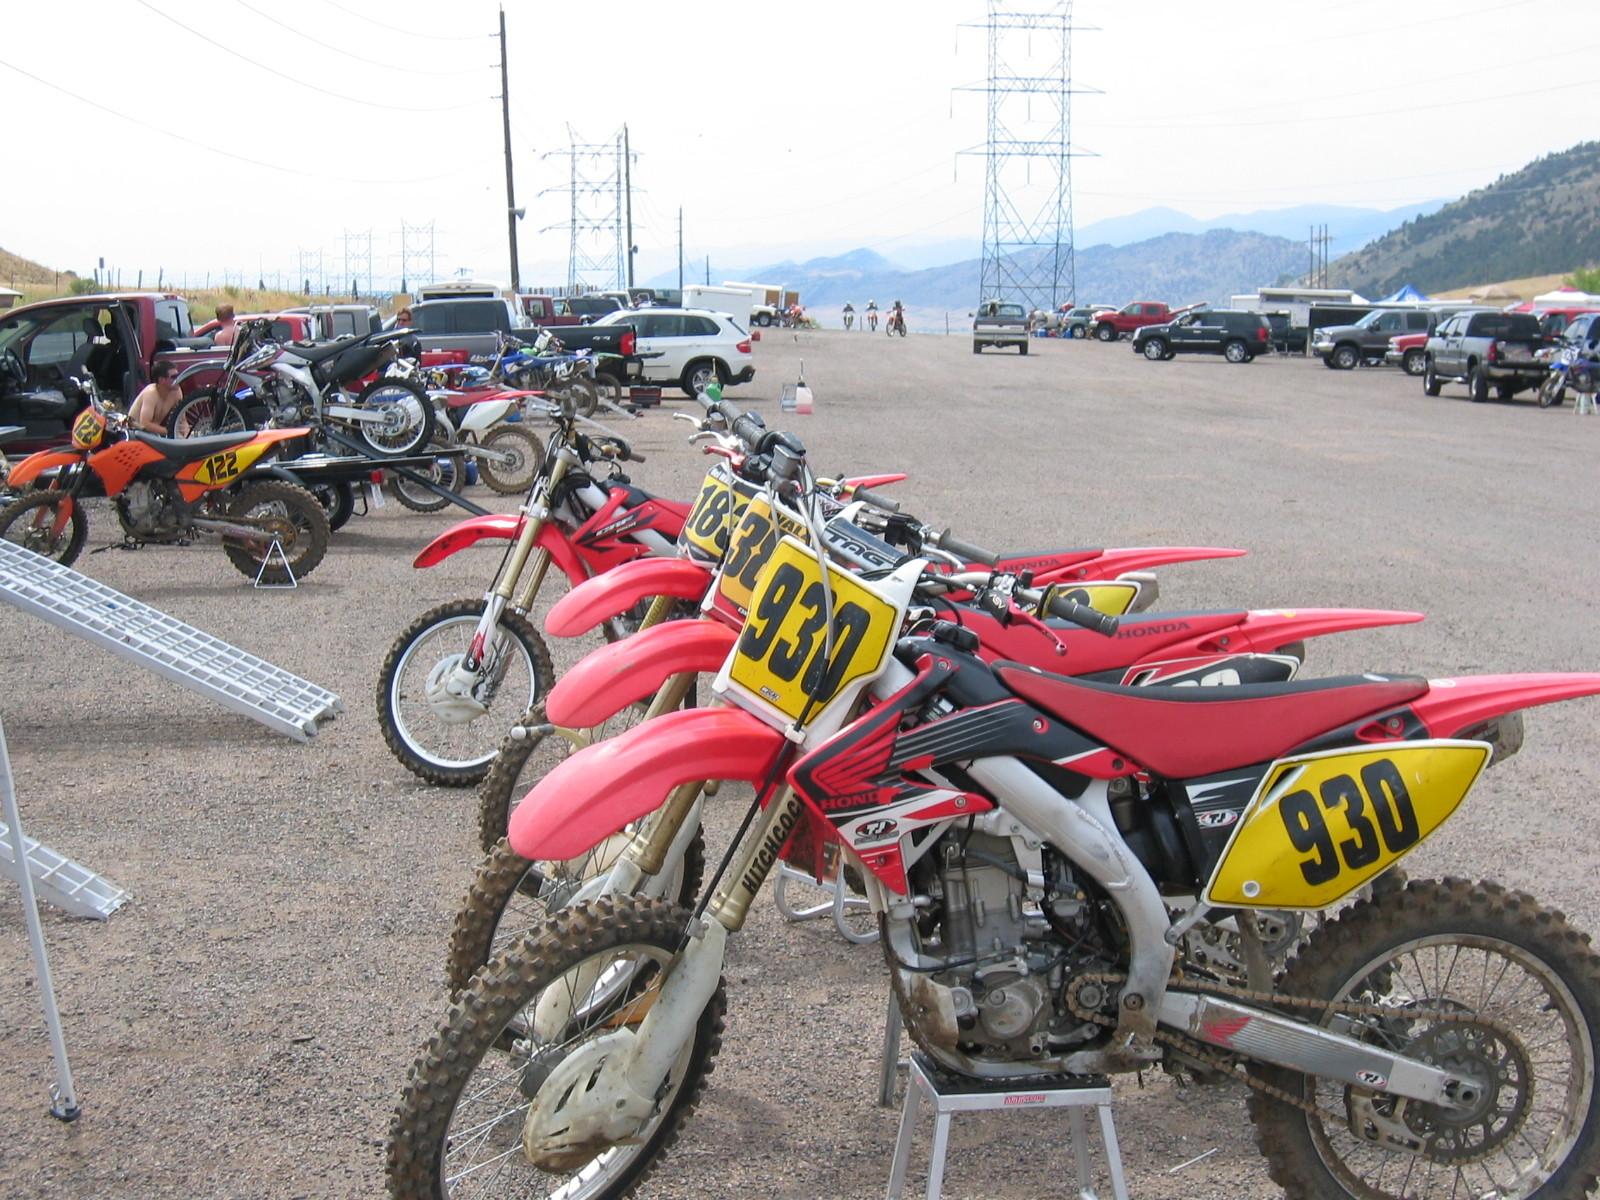 cjmx's Honda